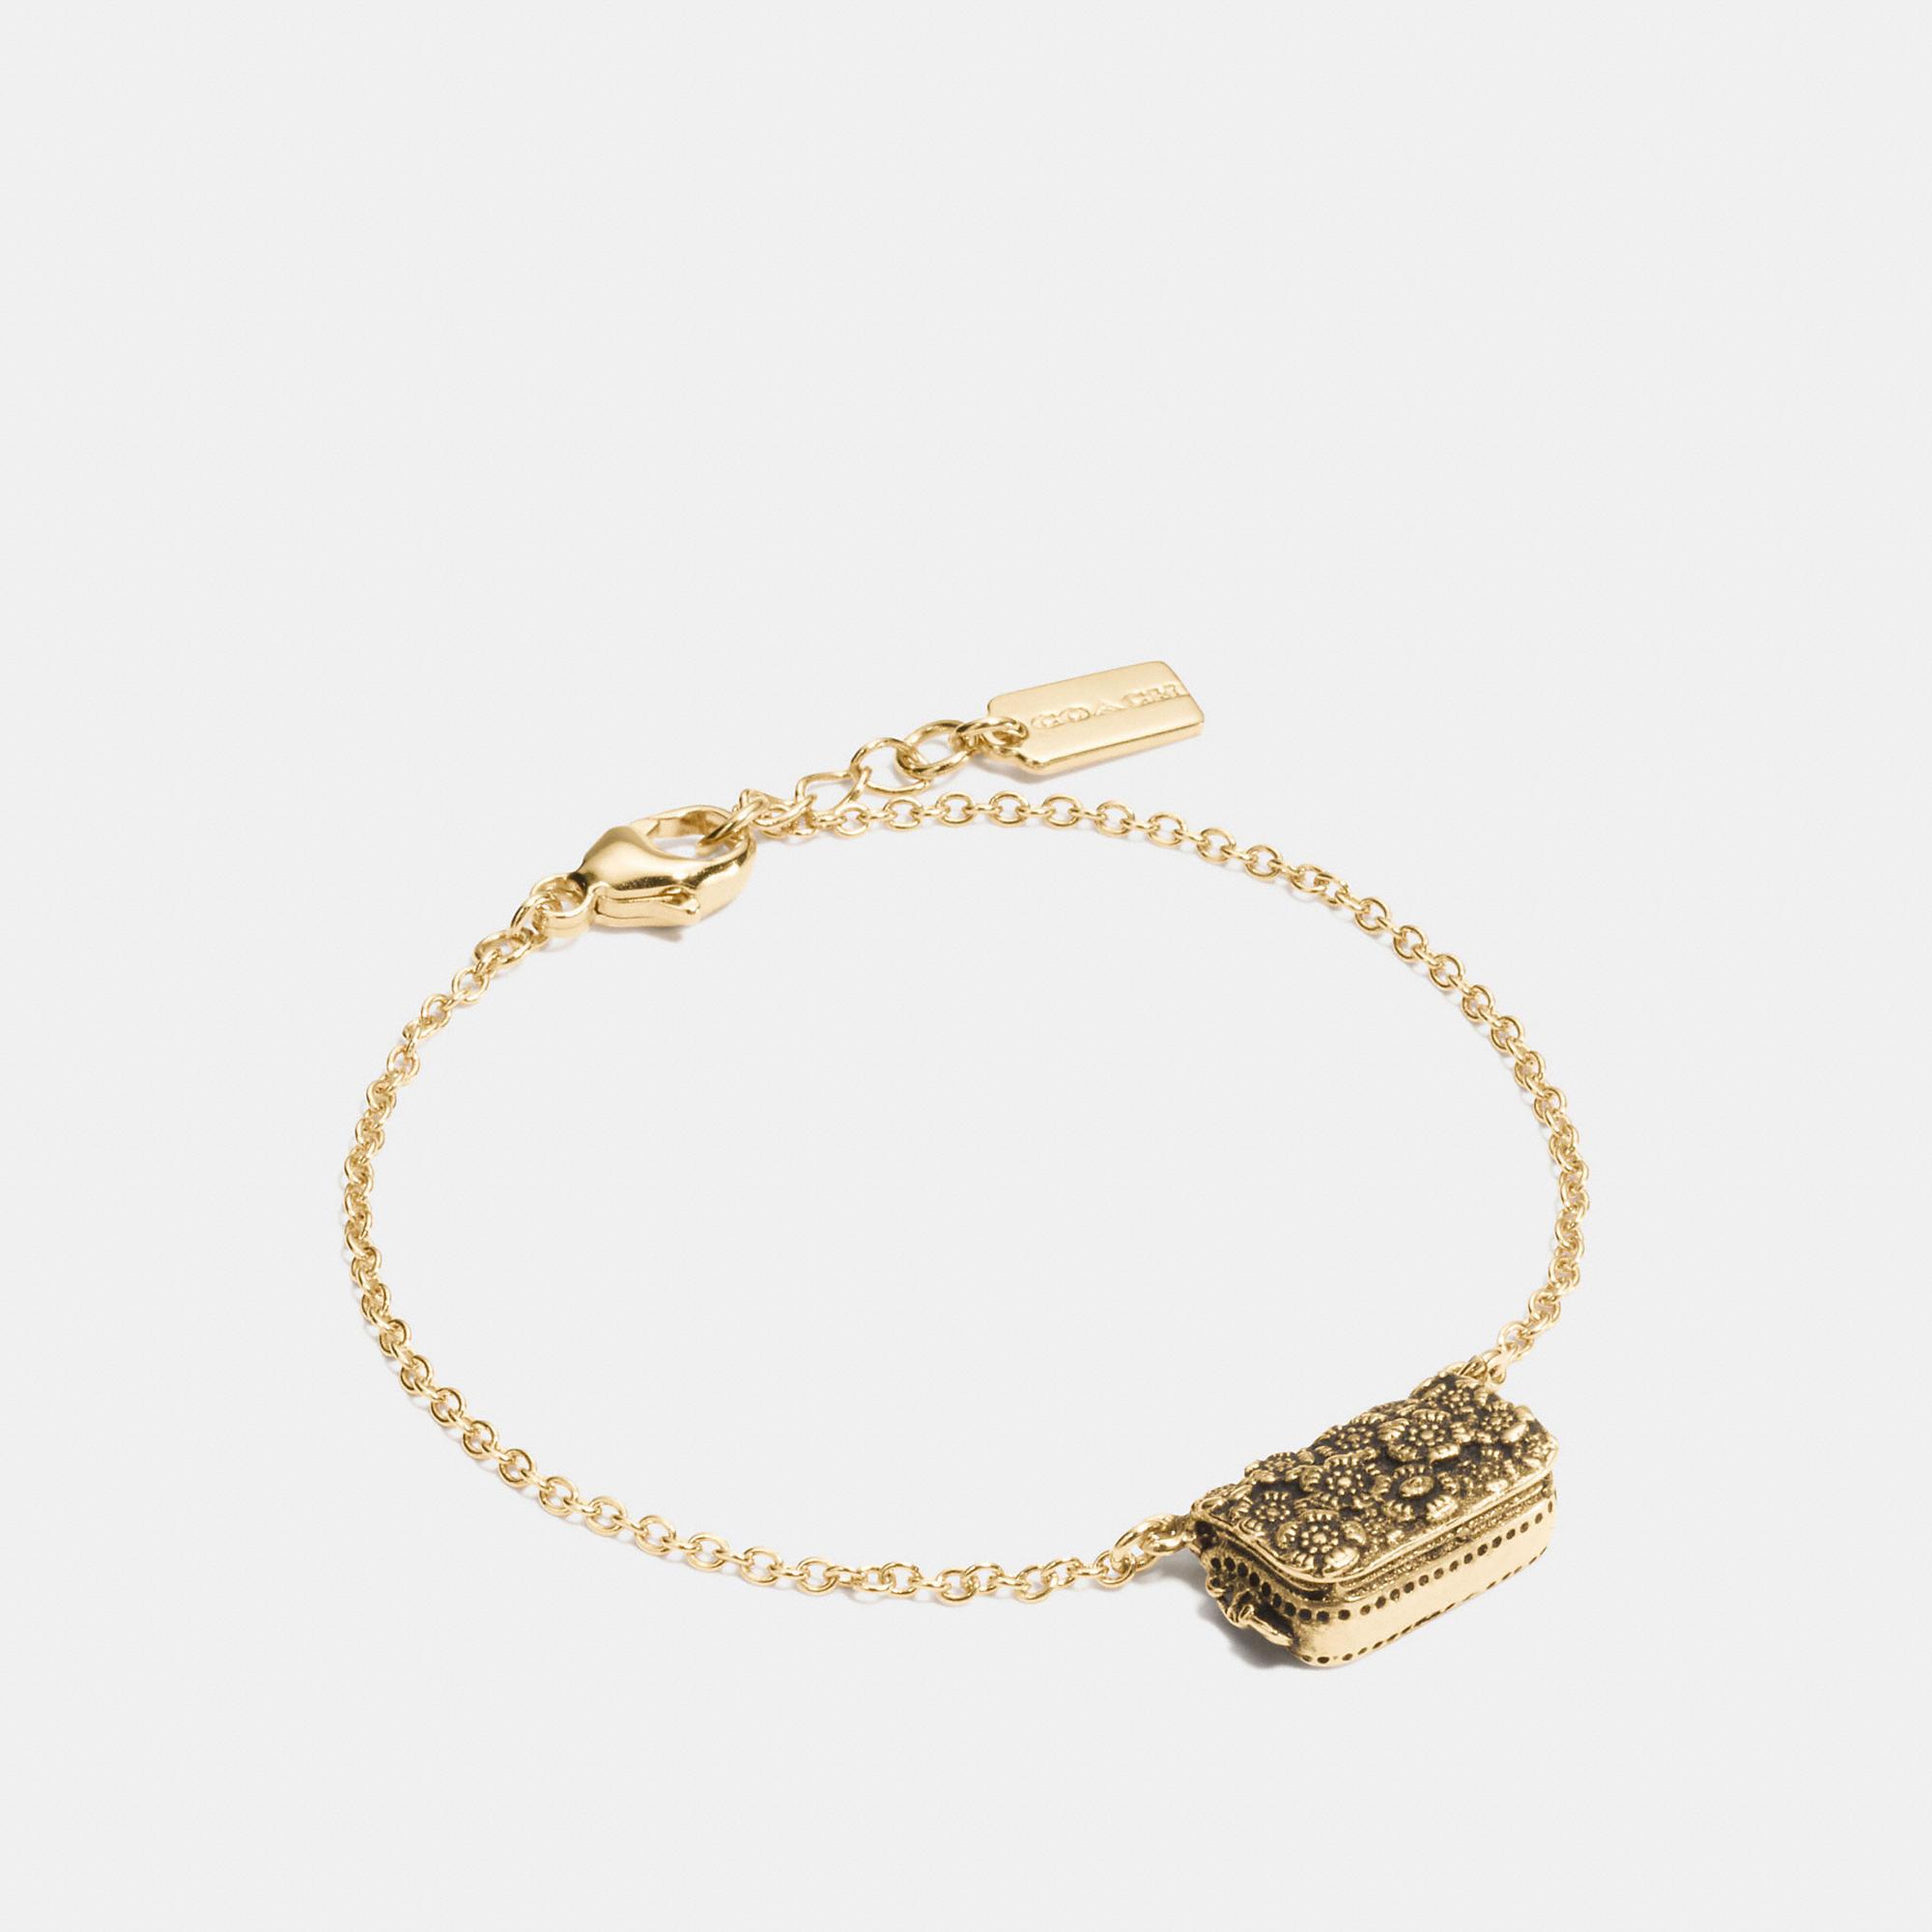 Coach Dinky Chain Bracelet